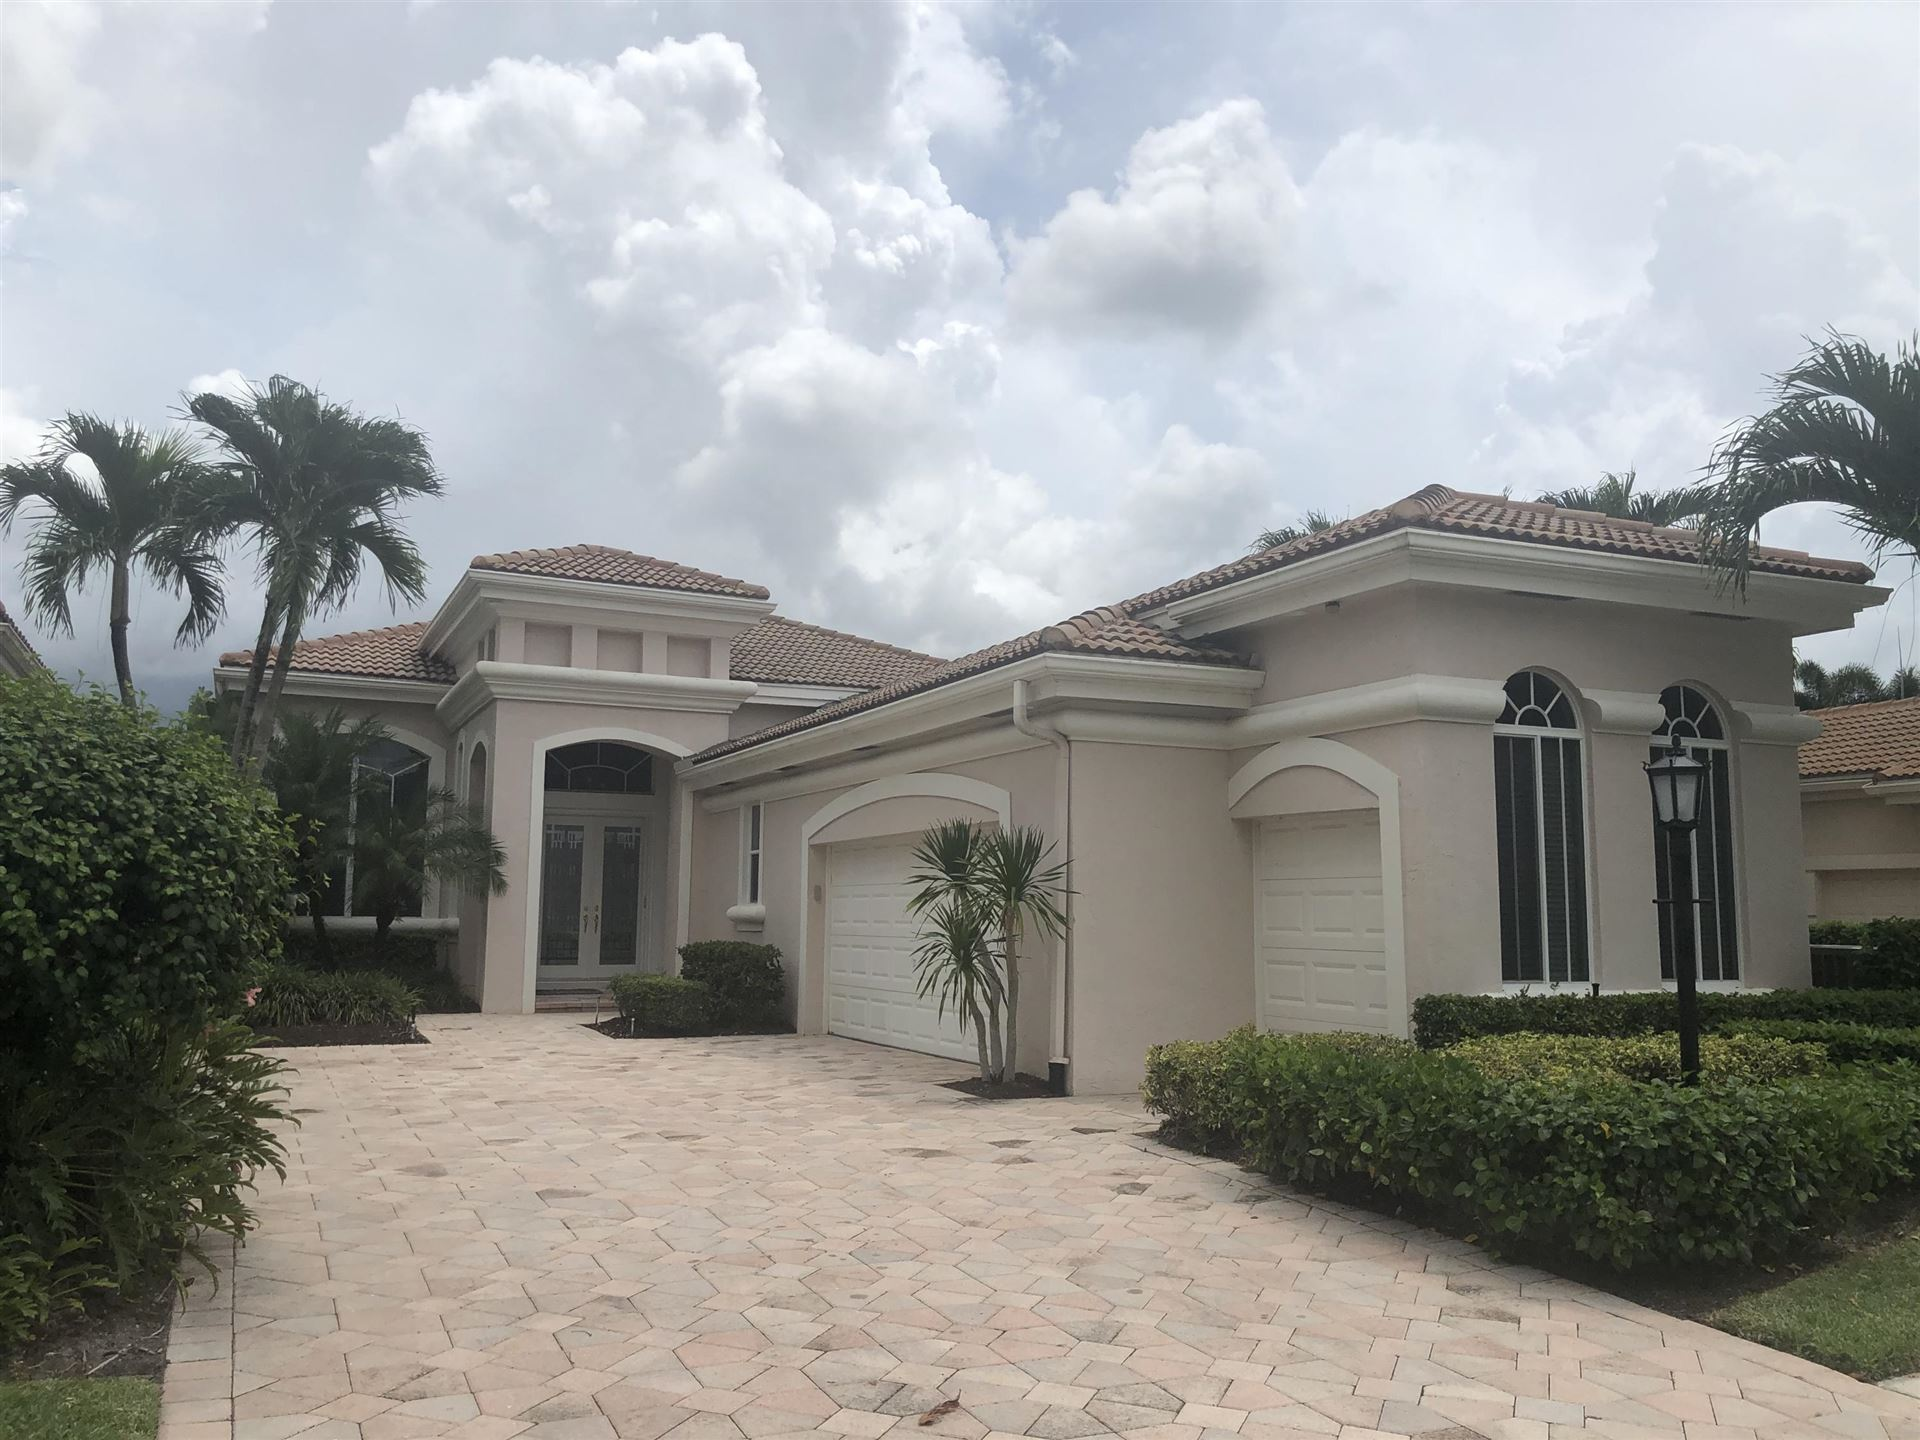 Photo of 391 Isle Court, Palm Beach Gardens, FL 33418 (MLS # RX-10663068)